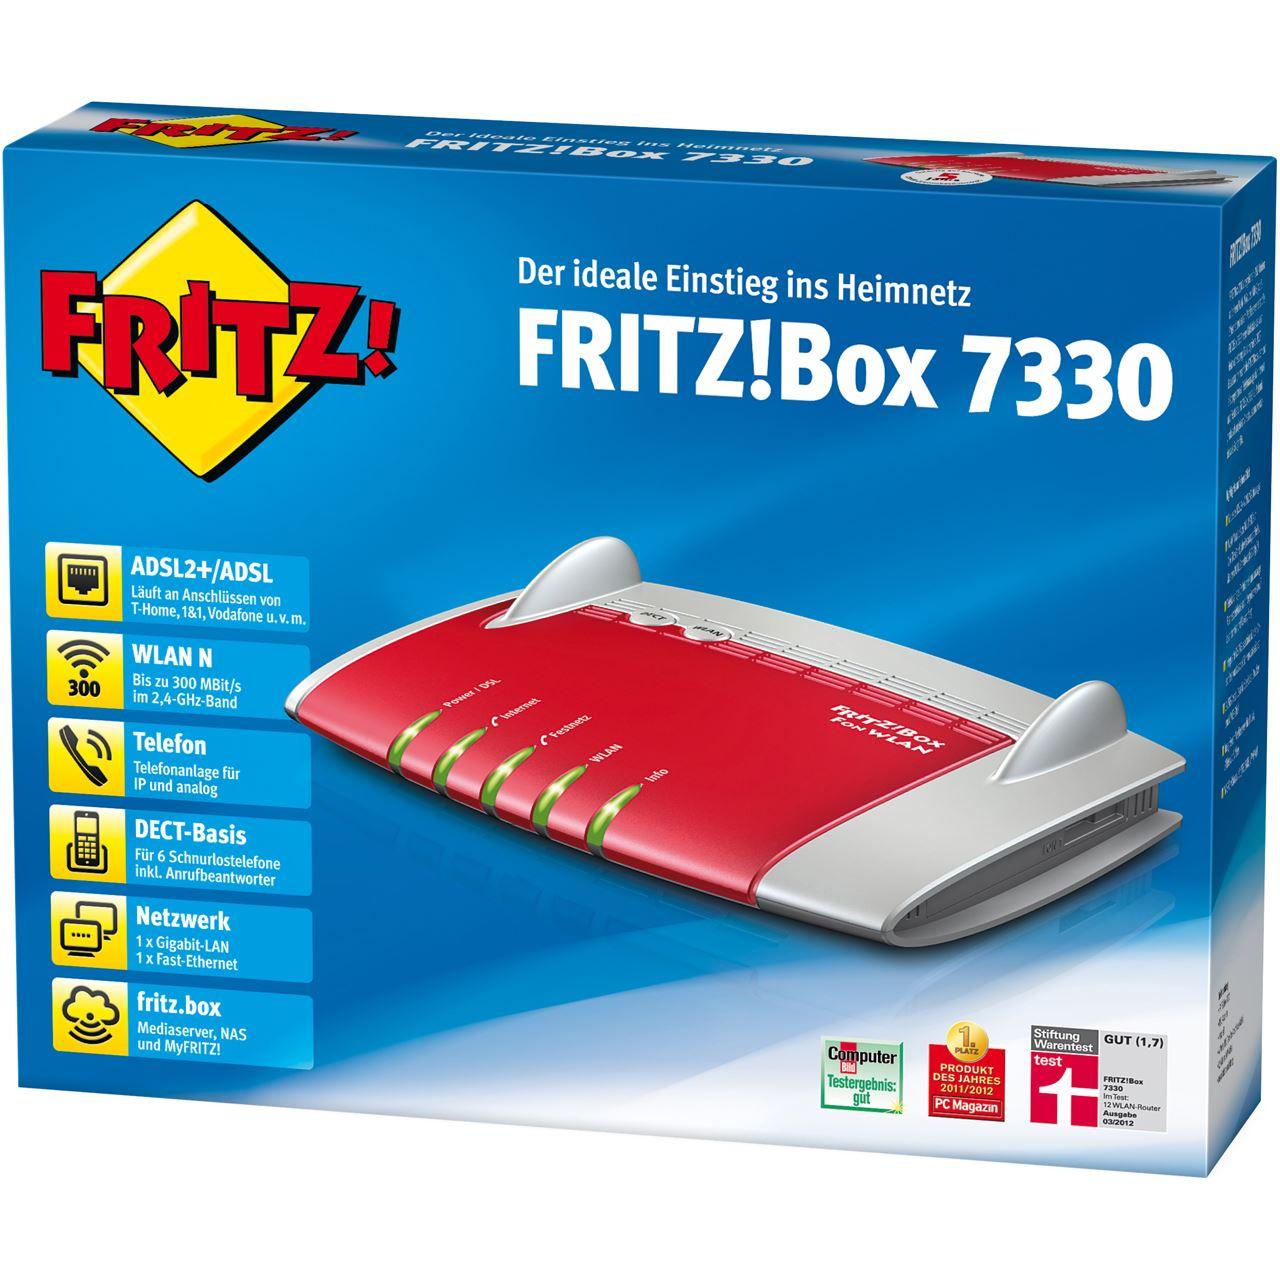 Update Fritzbox 7330